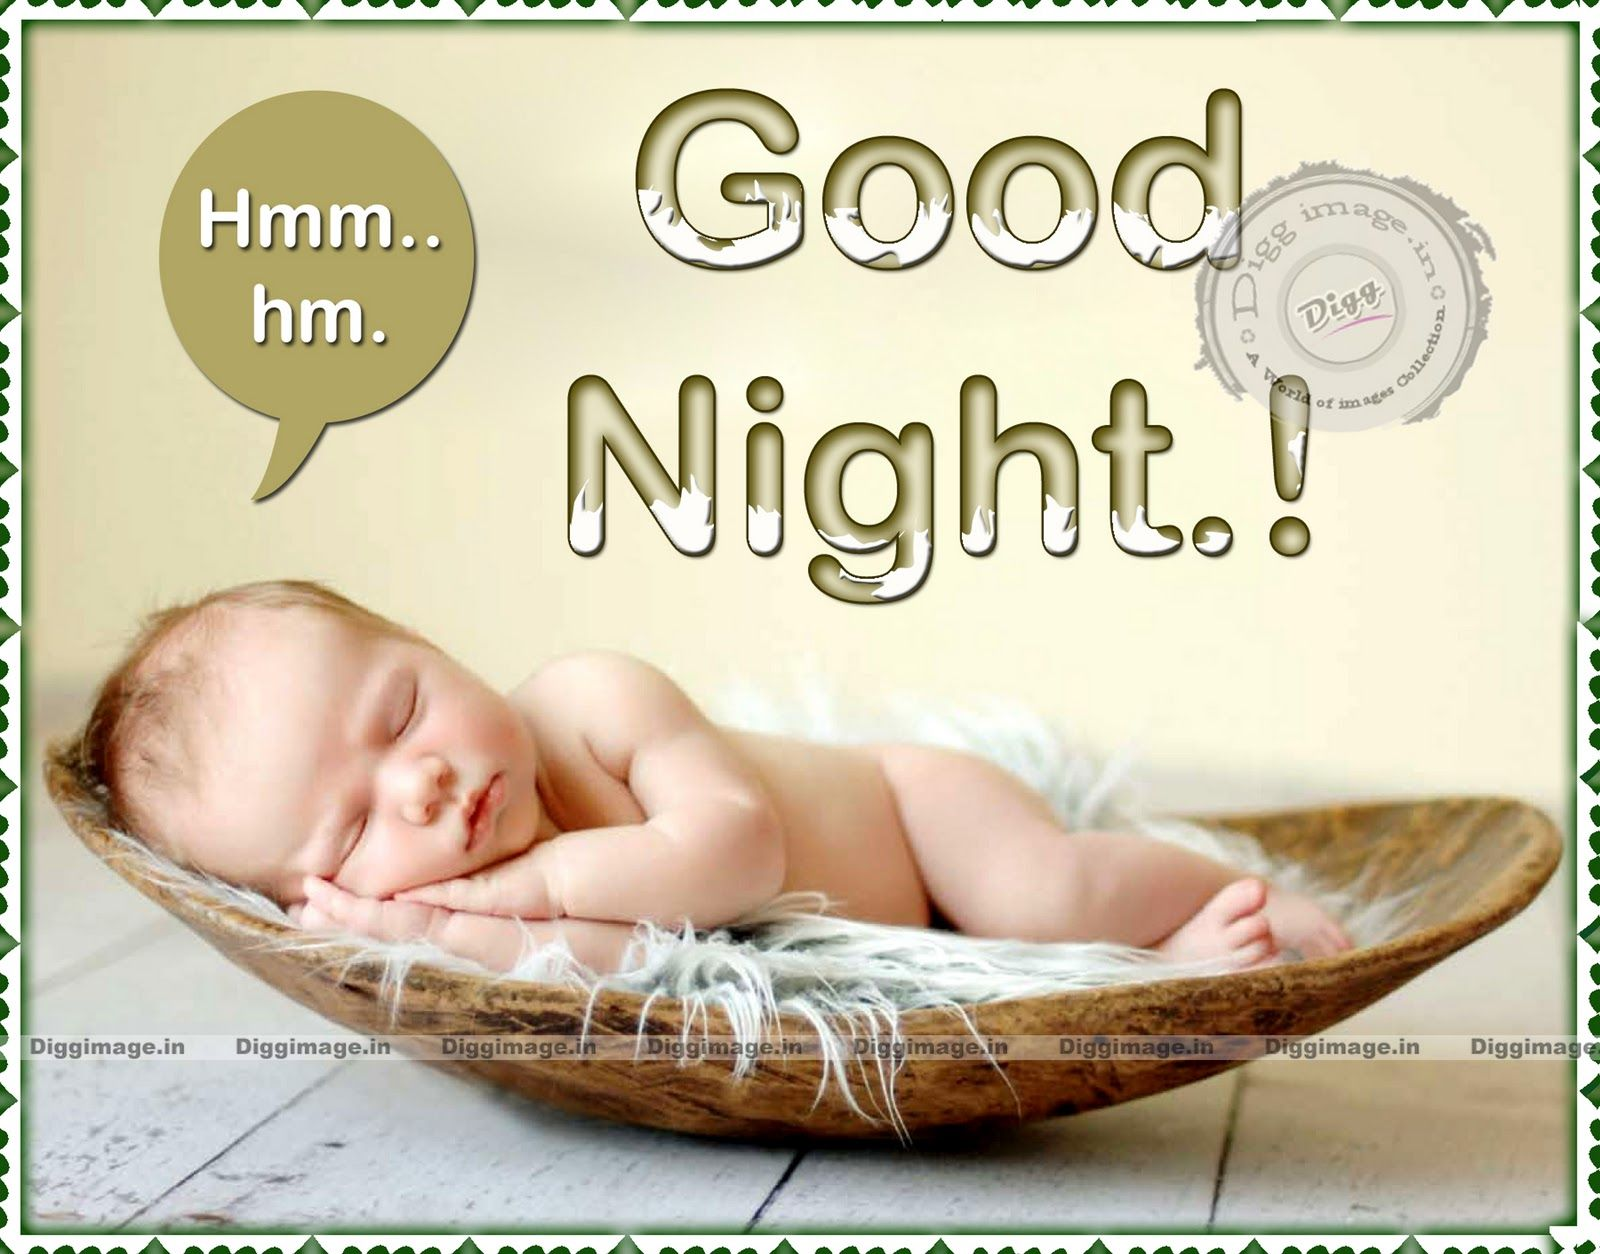 Full Hd Wallpapers 1080p Free Hd Desktop Backgrounds Good Night Wallpaper Lovely Good Night Cute Good Night